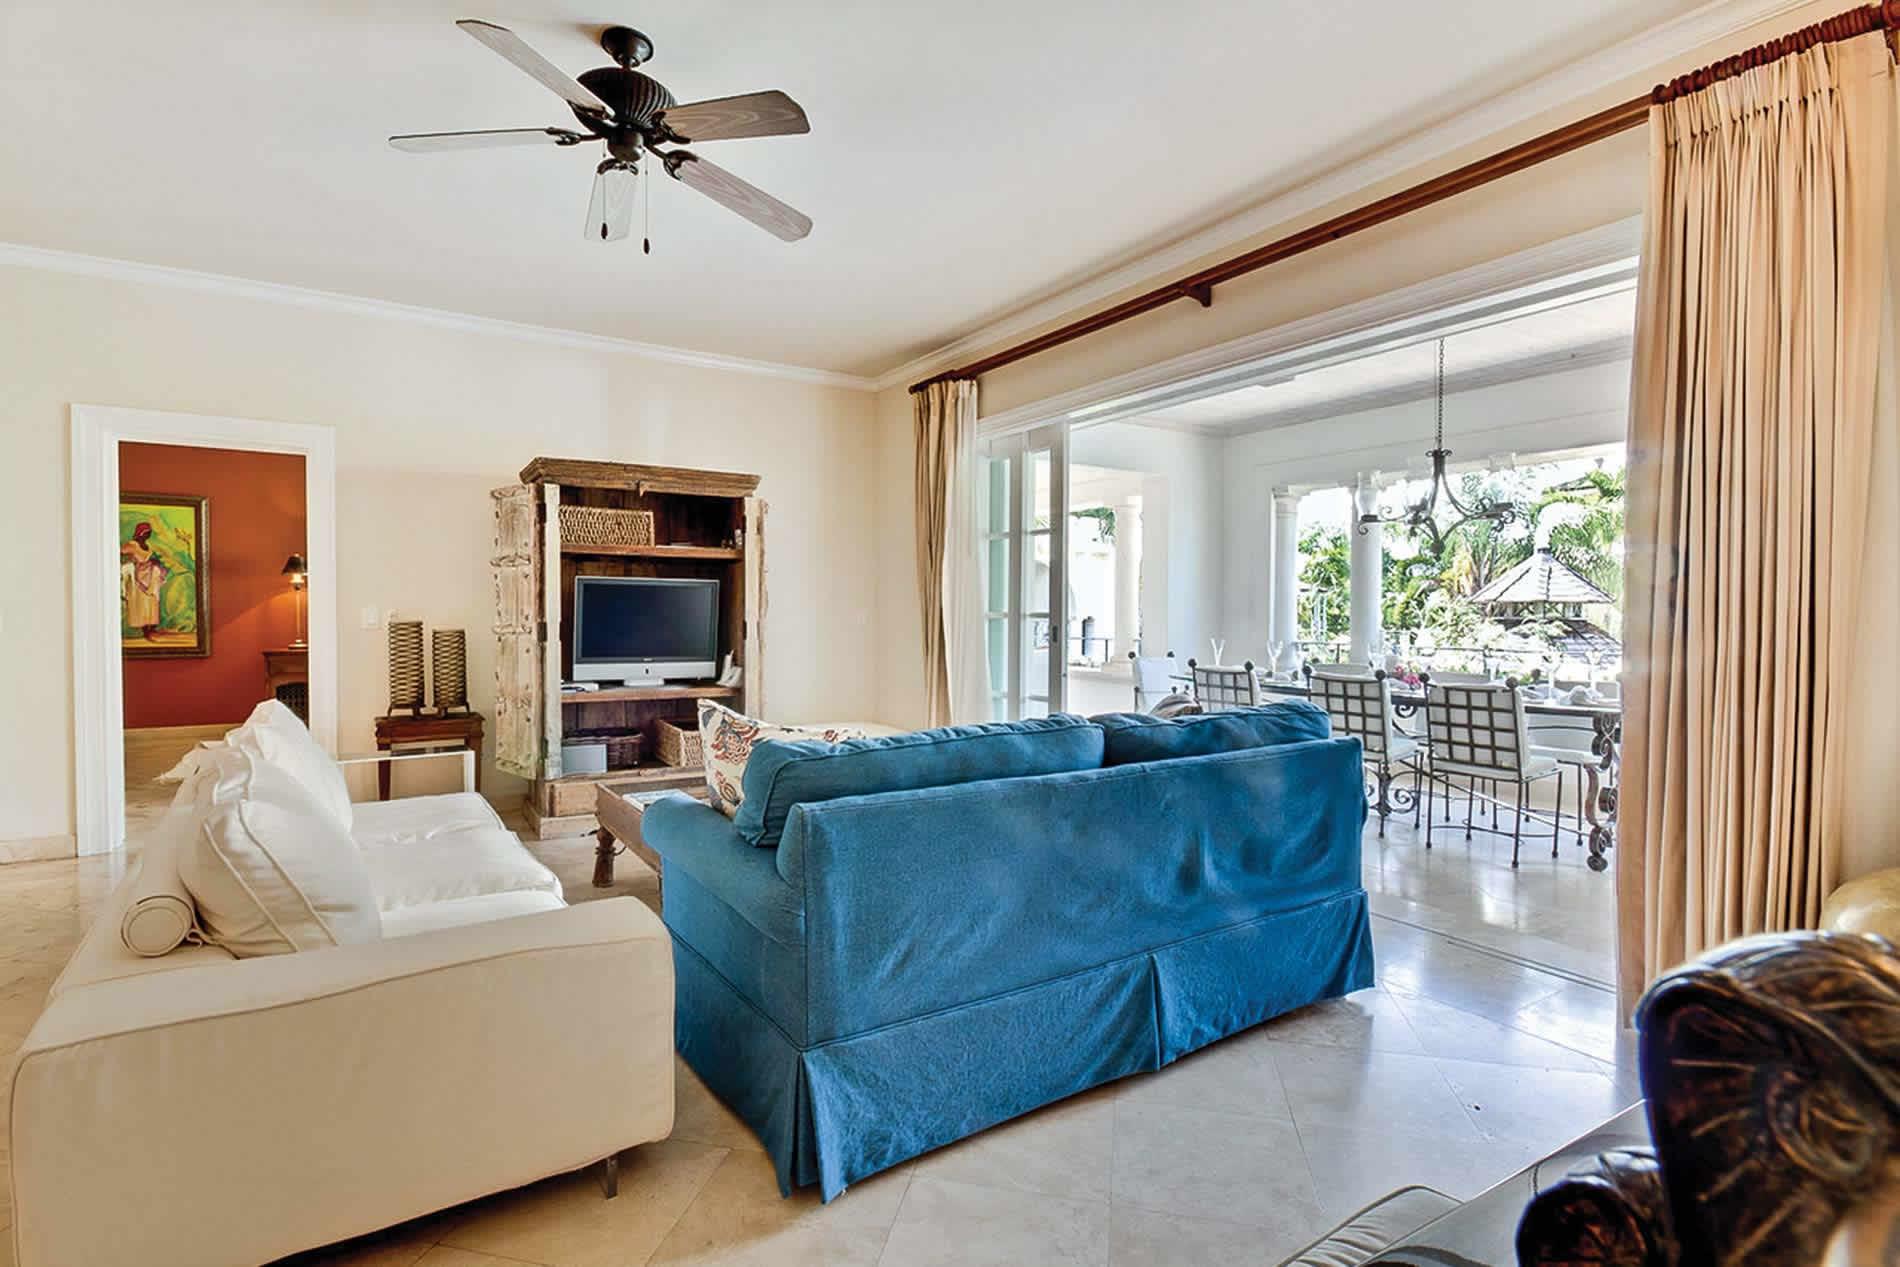 Apartment Tropical in Schooner Bay - sleeps 6 people